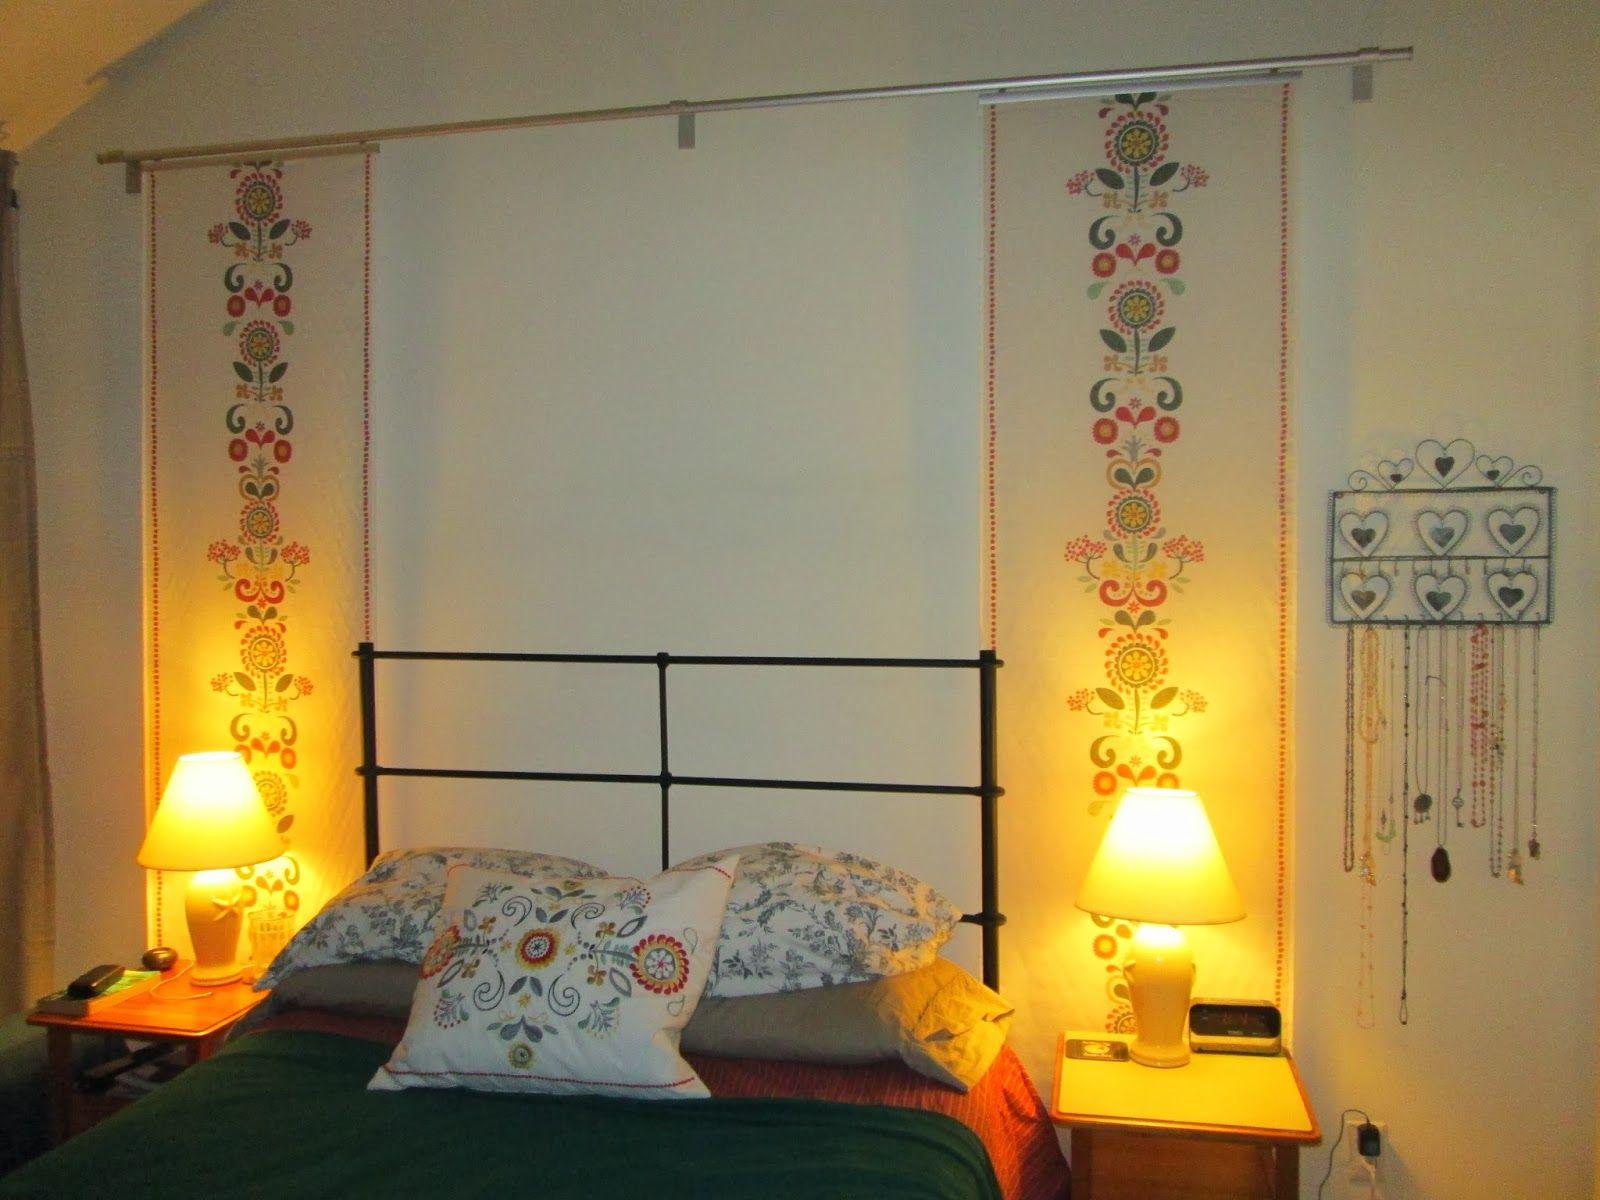 Ikea kvartal panel - Akerkulla Motive Ikea Kvartal System For The Home Pinterest Bedrooms